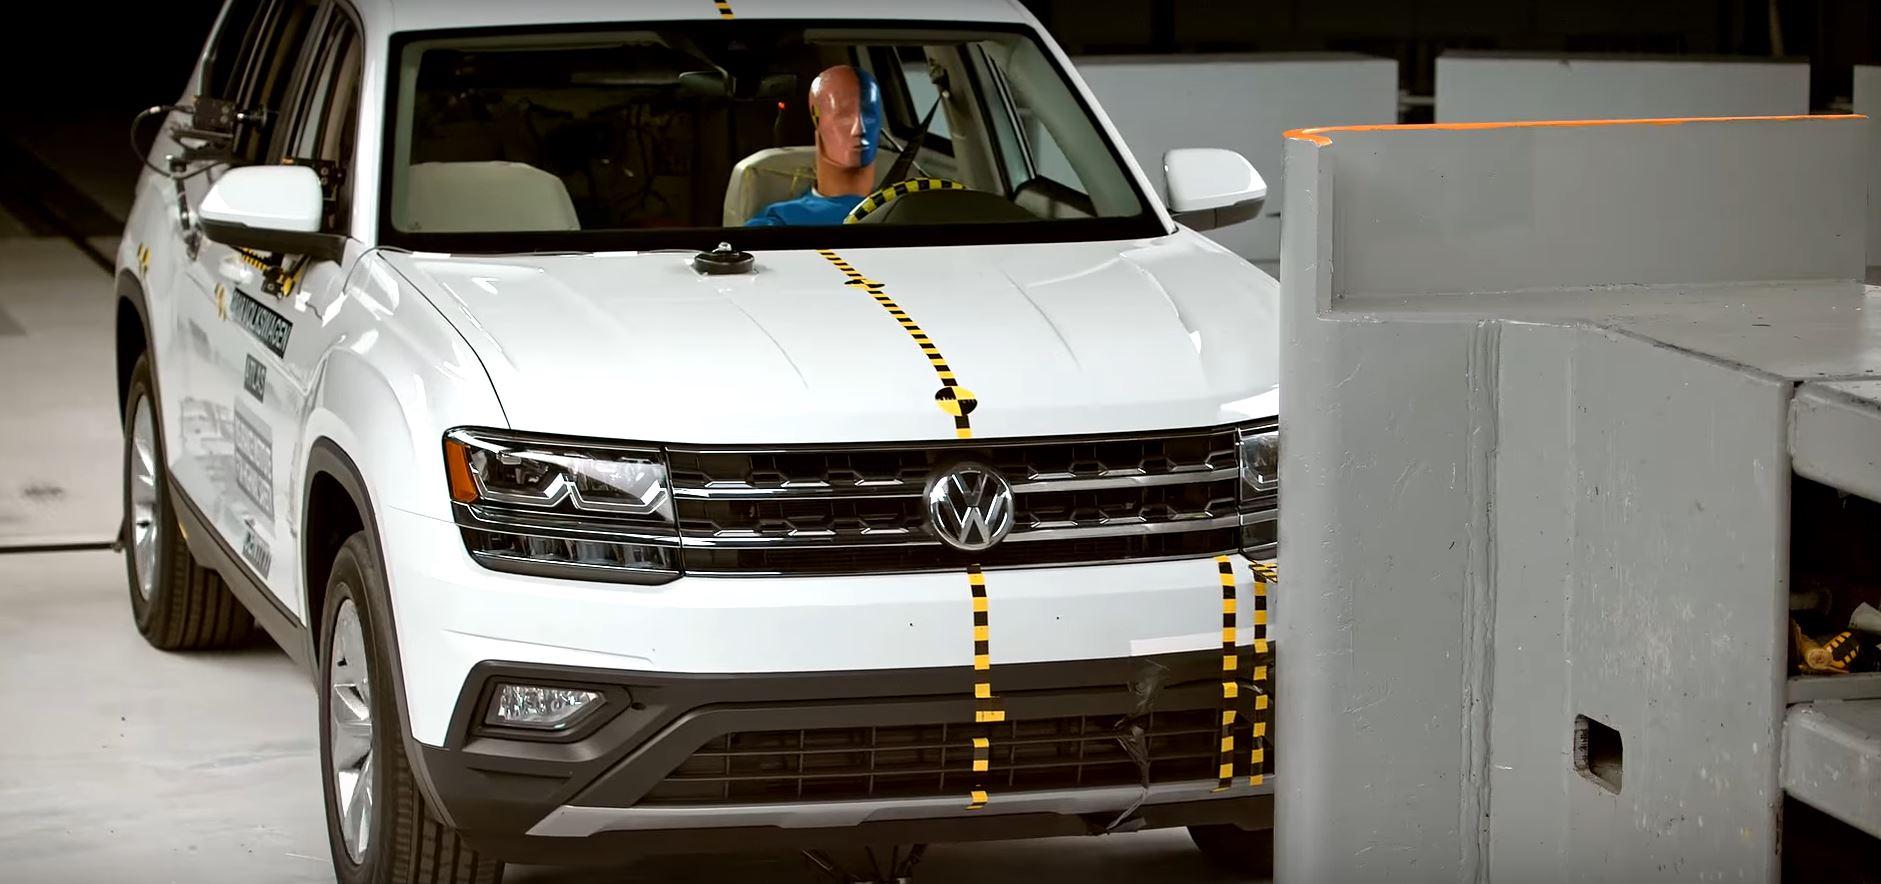 Volkswagen Atlas Misses IIHS Top Safety Pick Plus, But We Enjoyed the Crash Test - autoevolution